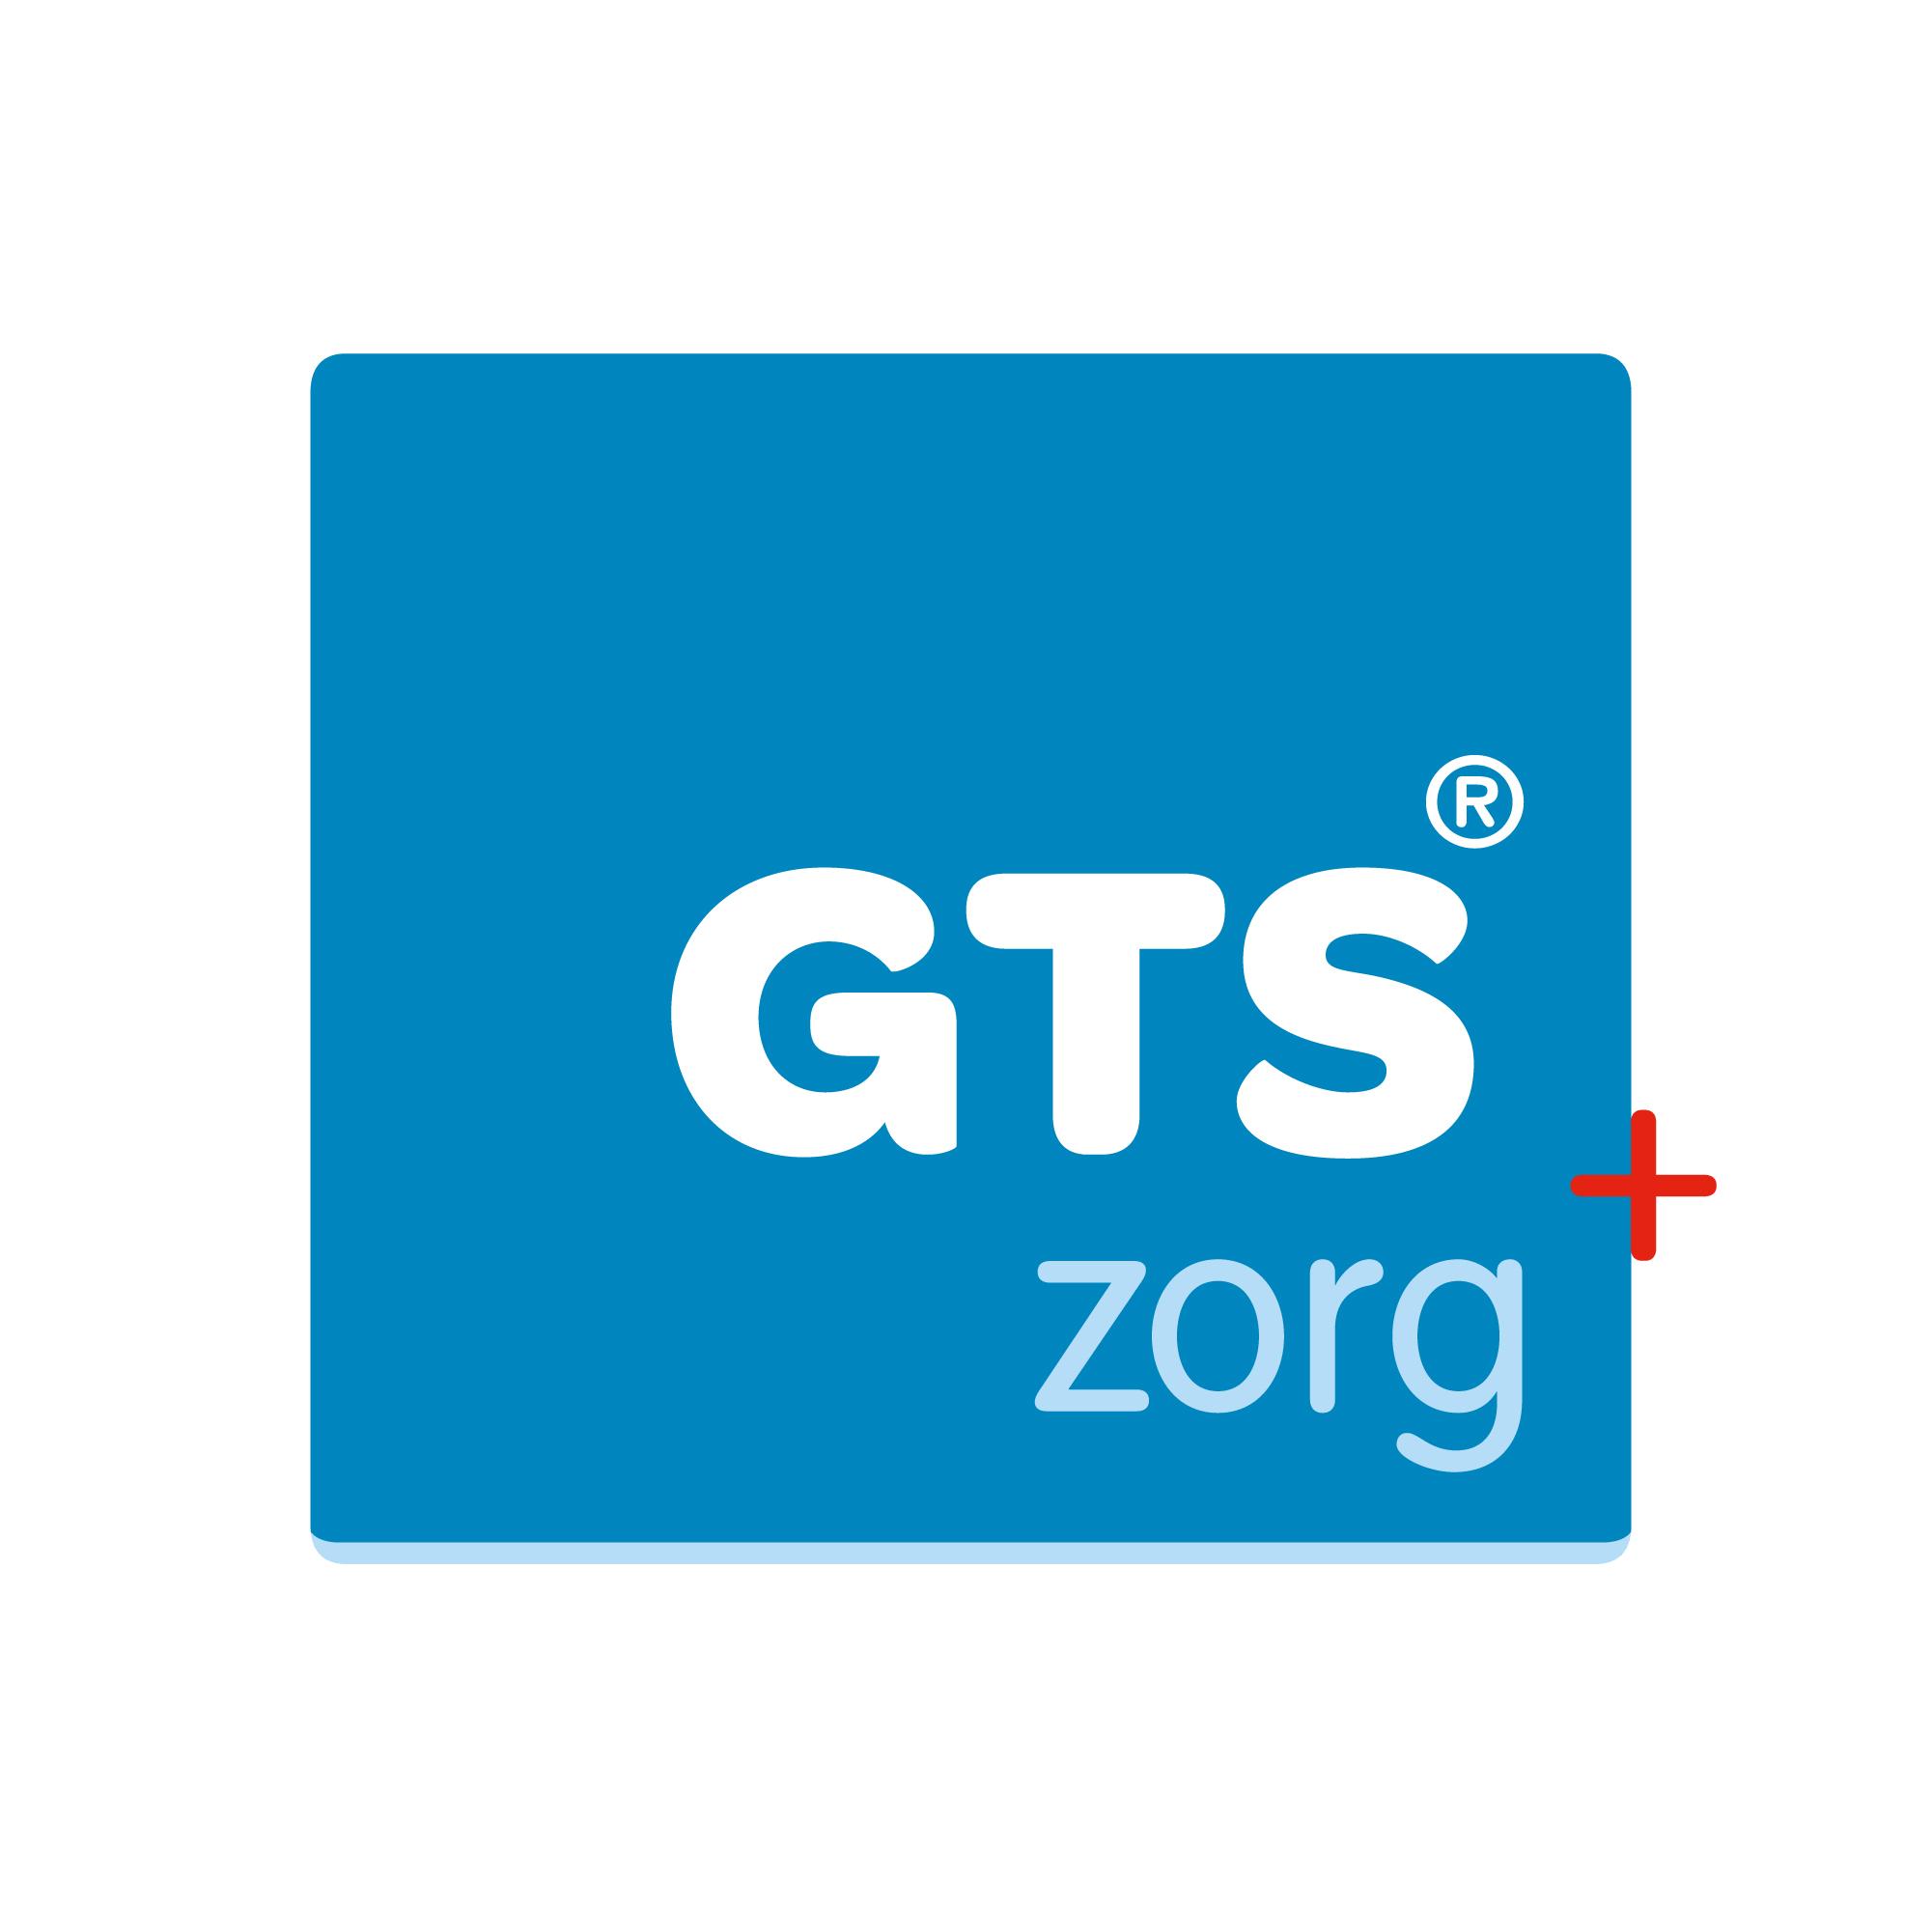 GTSzorg